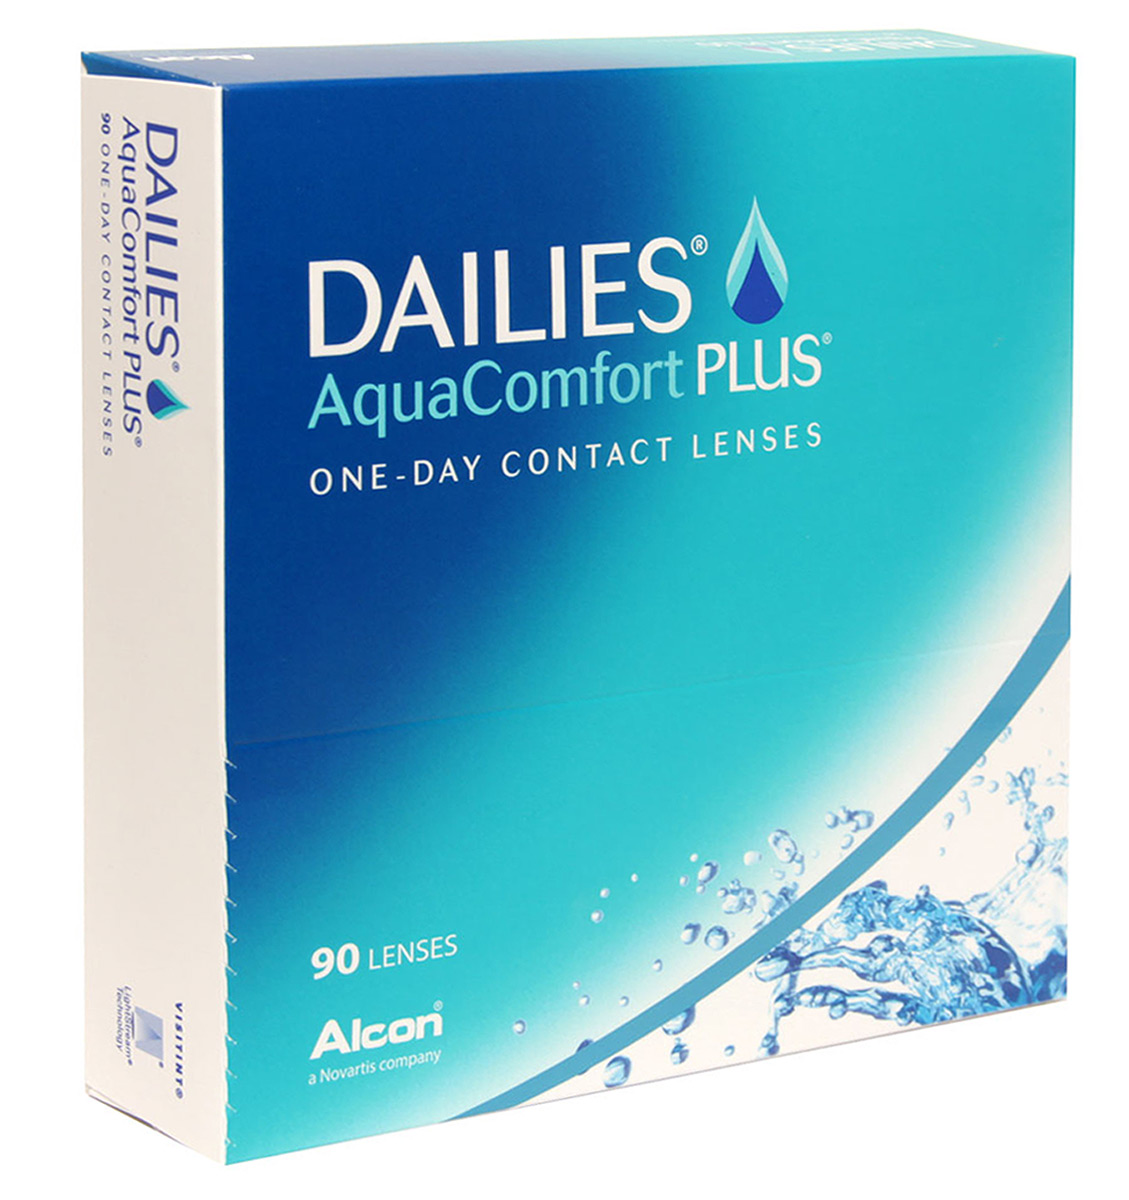 Alcon-CIBA Vision контактные линзы Dailies AquaComfort Plus (90шт / 8.7 / 14.0 / +5.75)